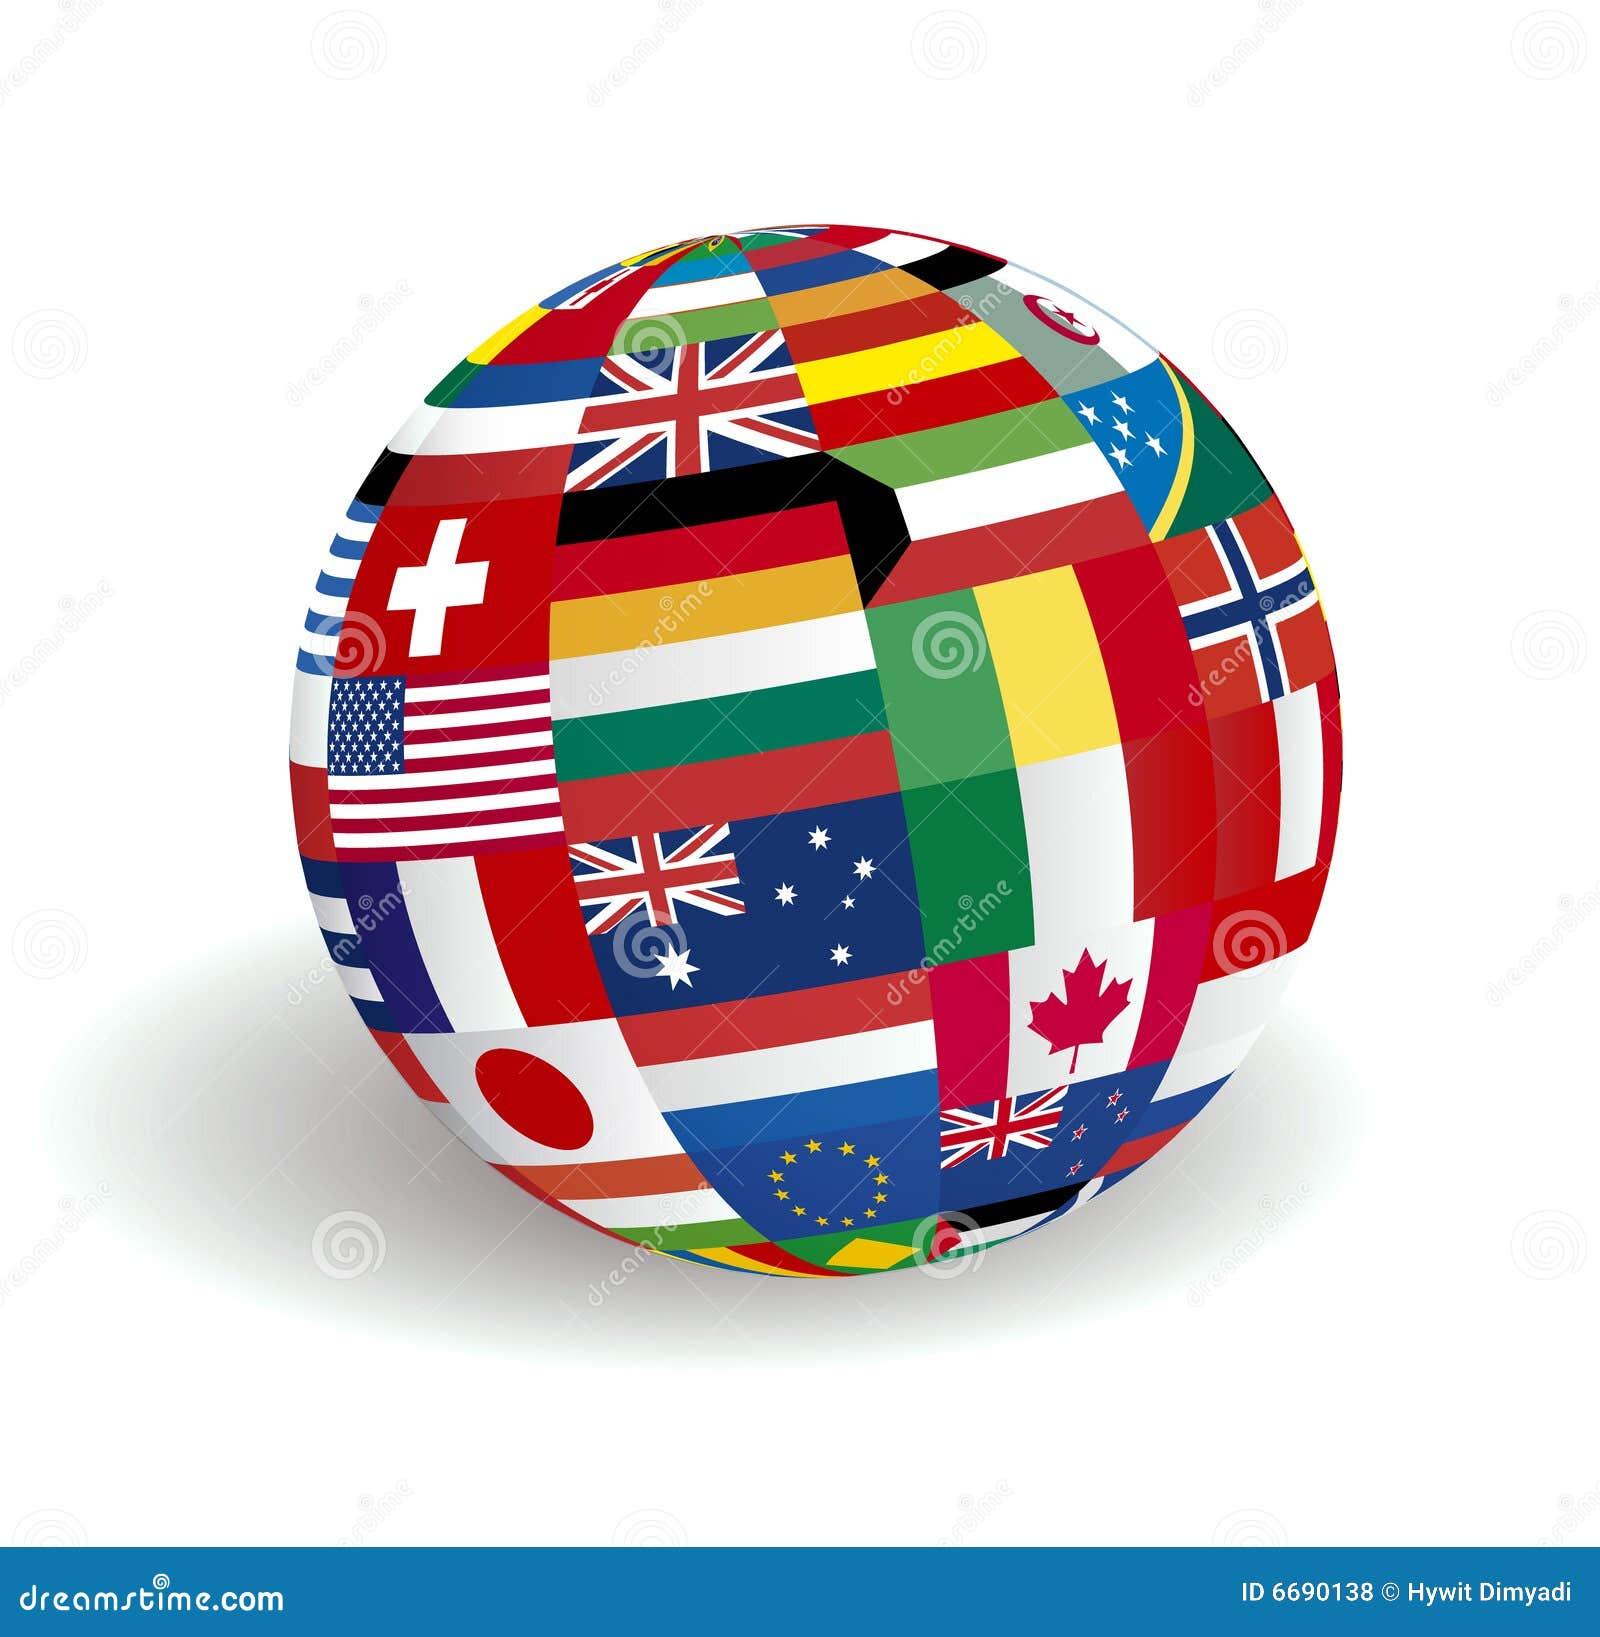 United World Flags Royalty Free Stock Photos - Image: 6690138